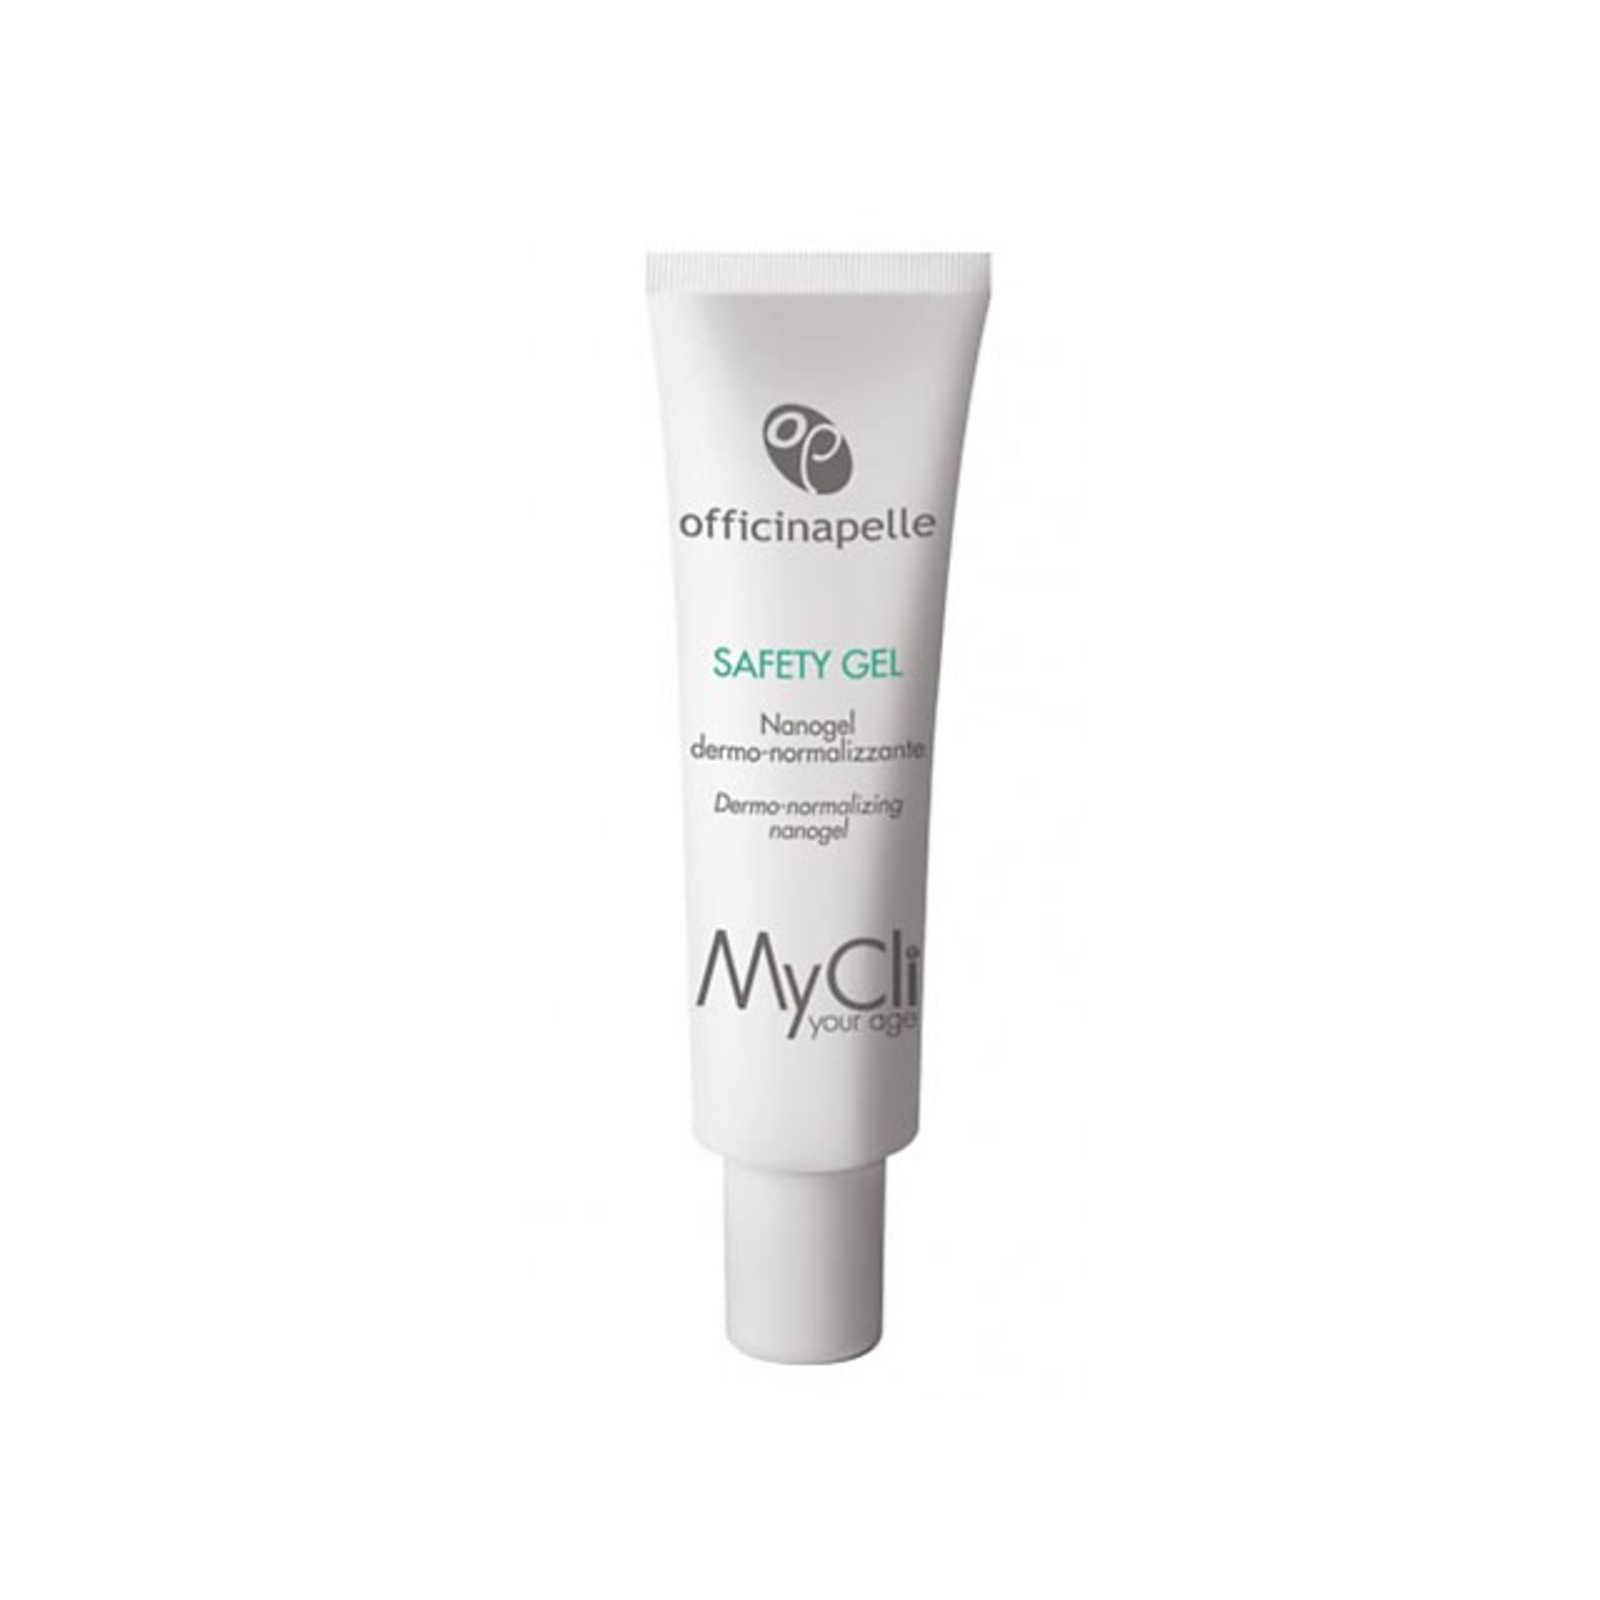 Mycli - Safety Gel - Nanogel Dermo-Normalizzante